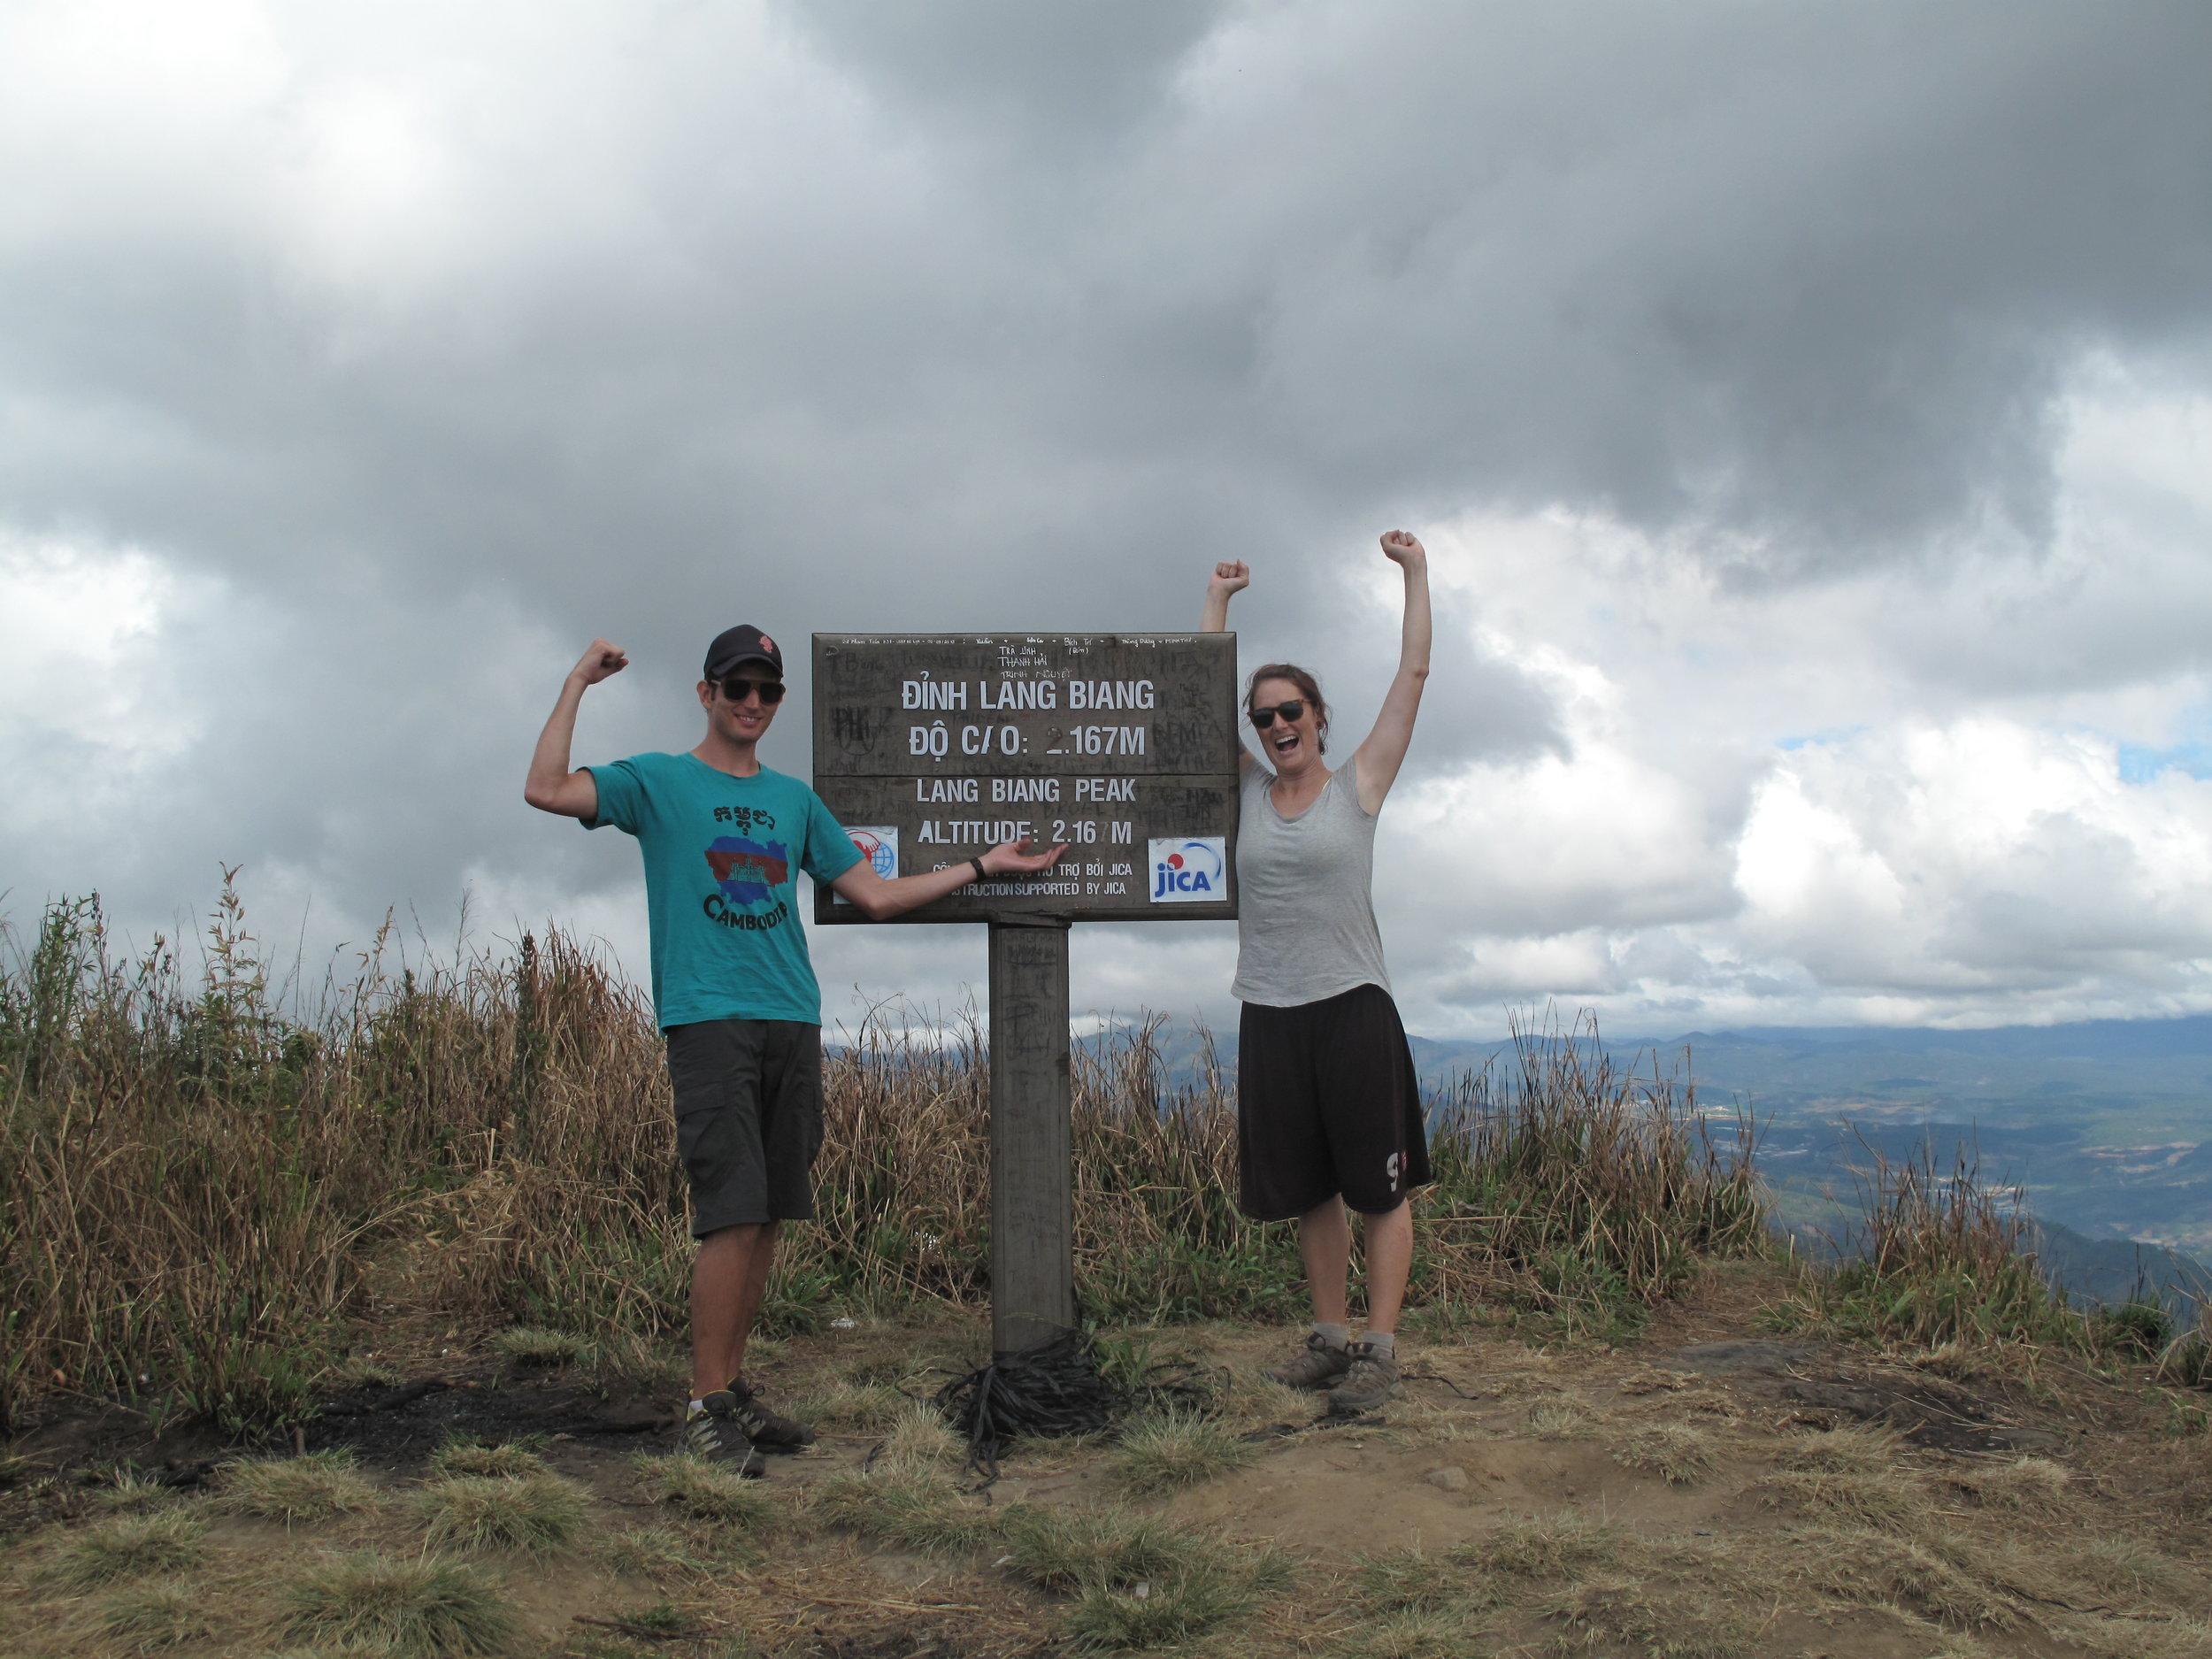 We did it! Three Peaks hike, Dalat